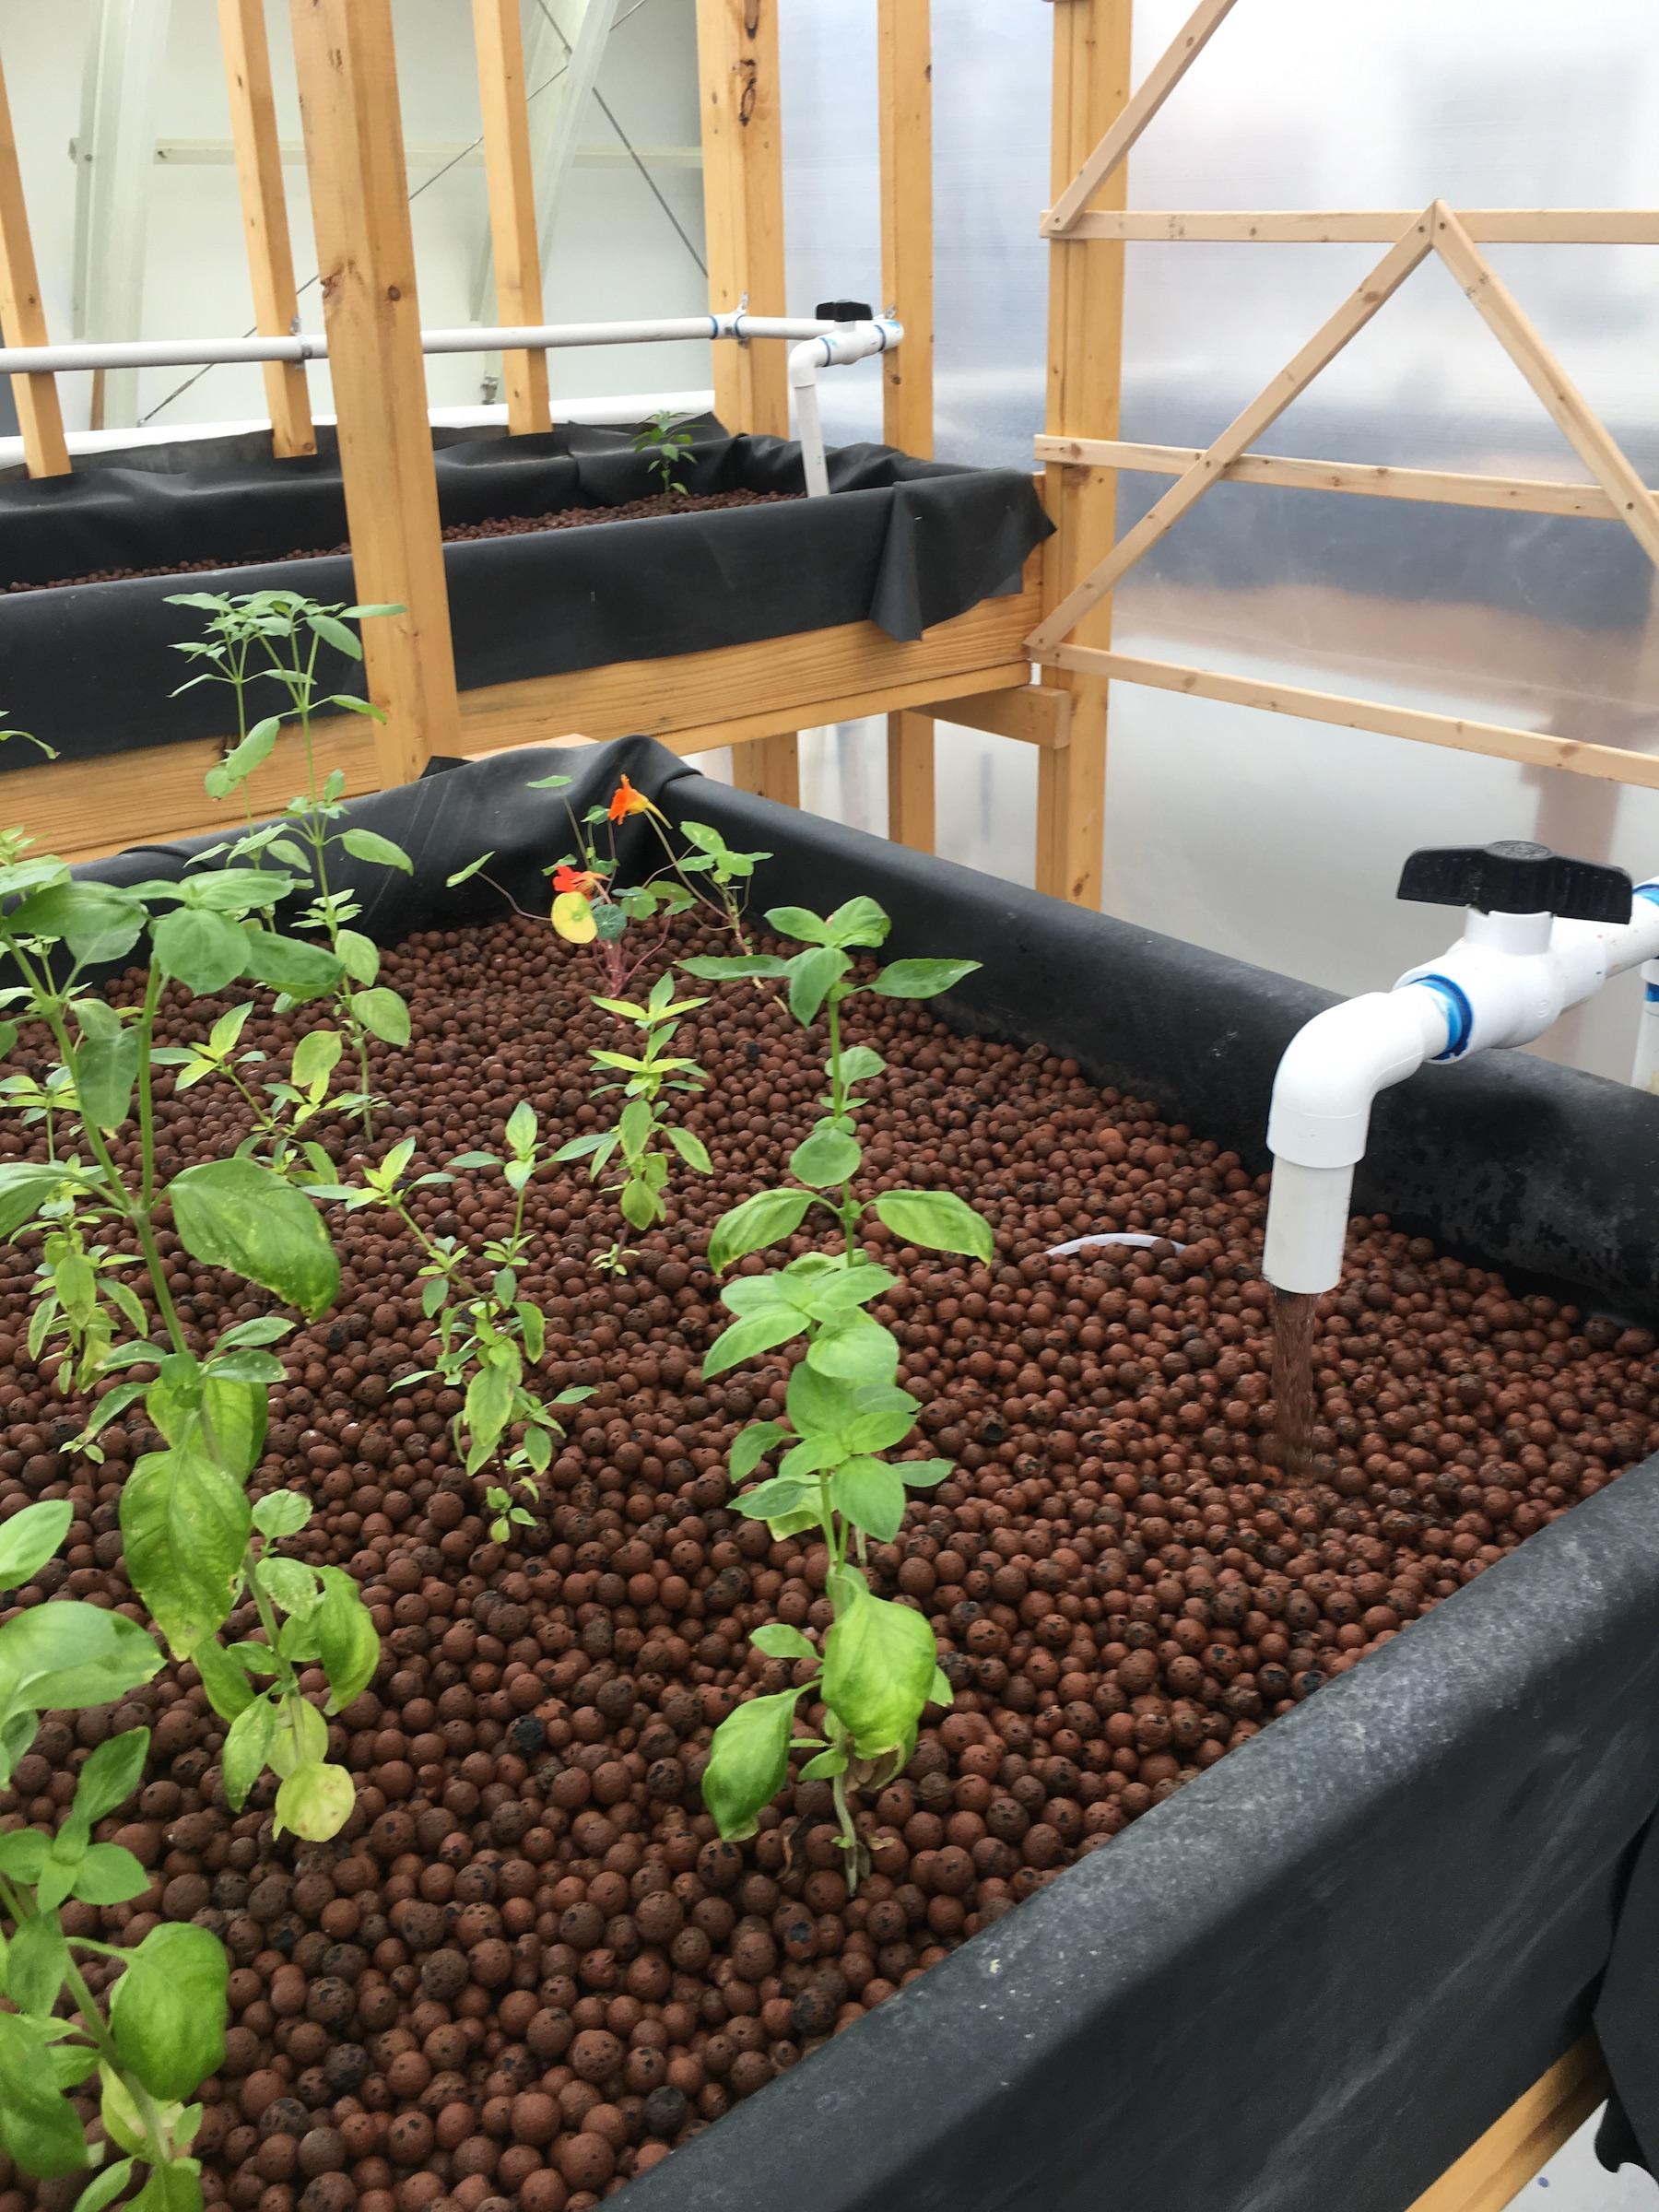 Tao Yuan Opens Aquaponics Greenhouse In Brunswick The